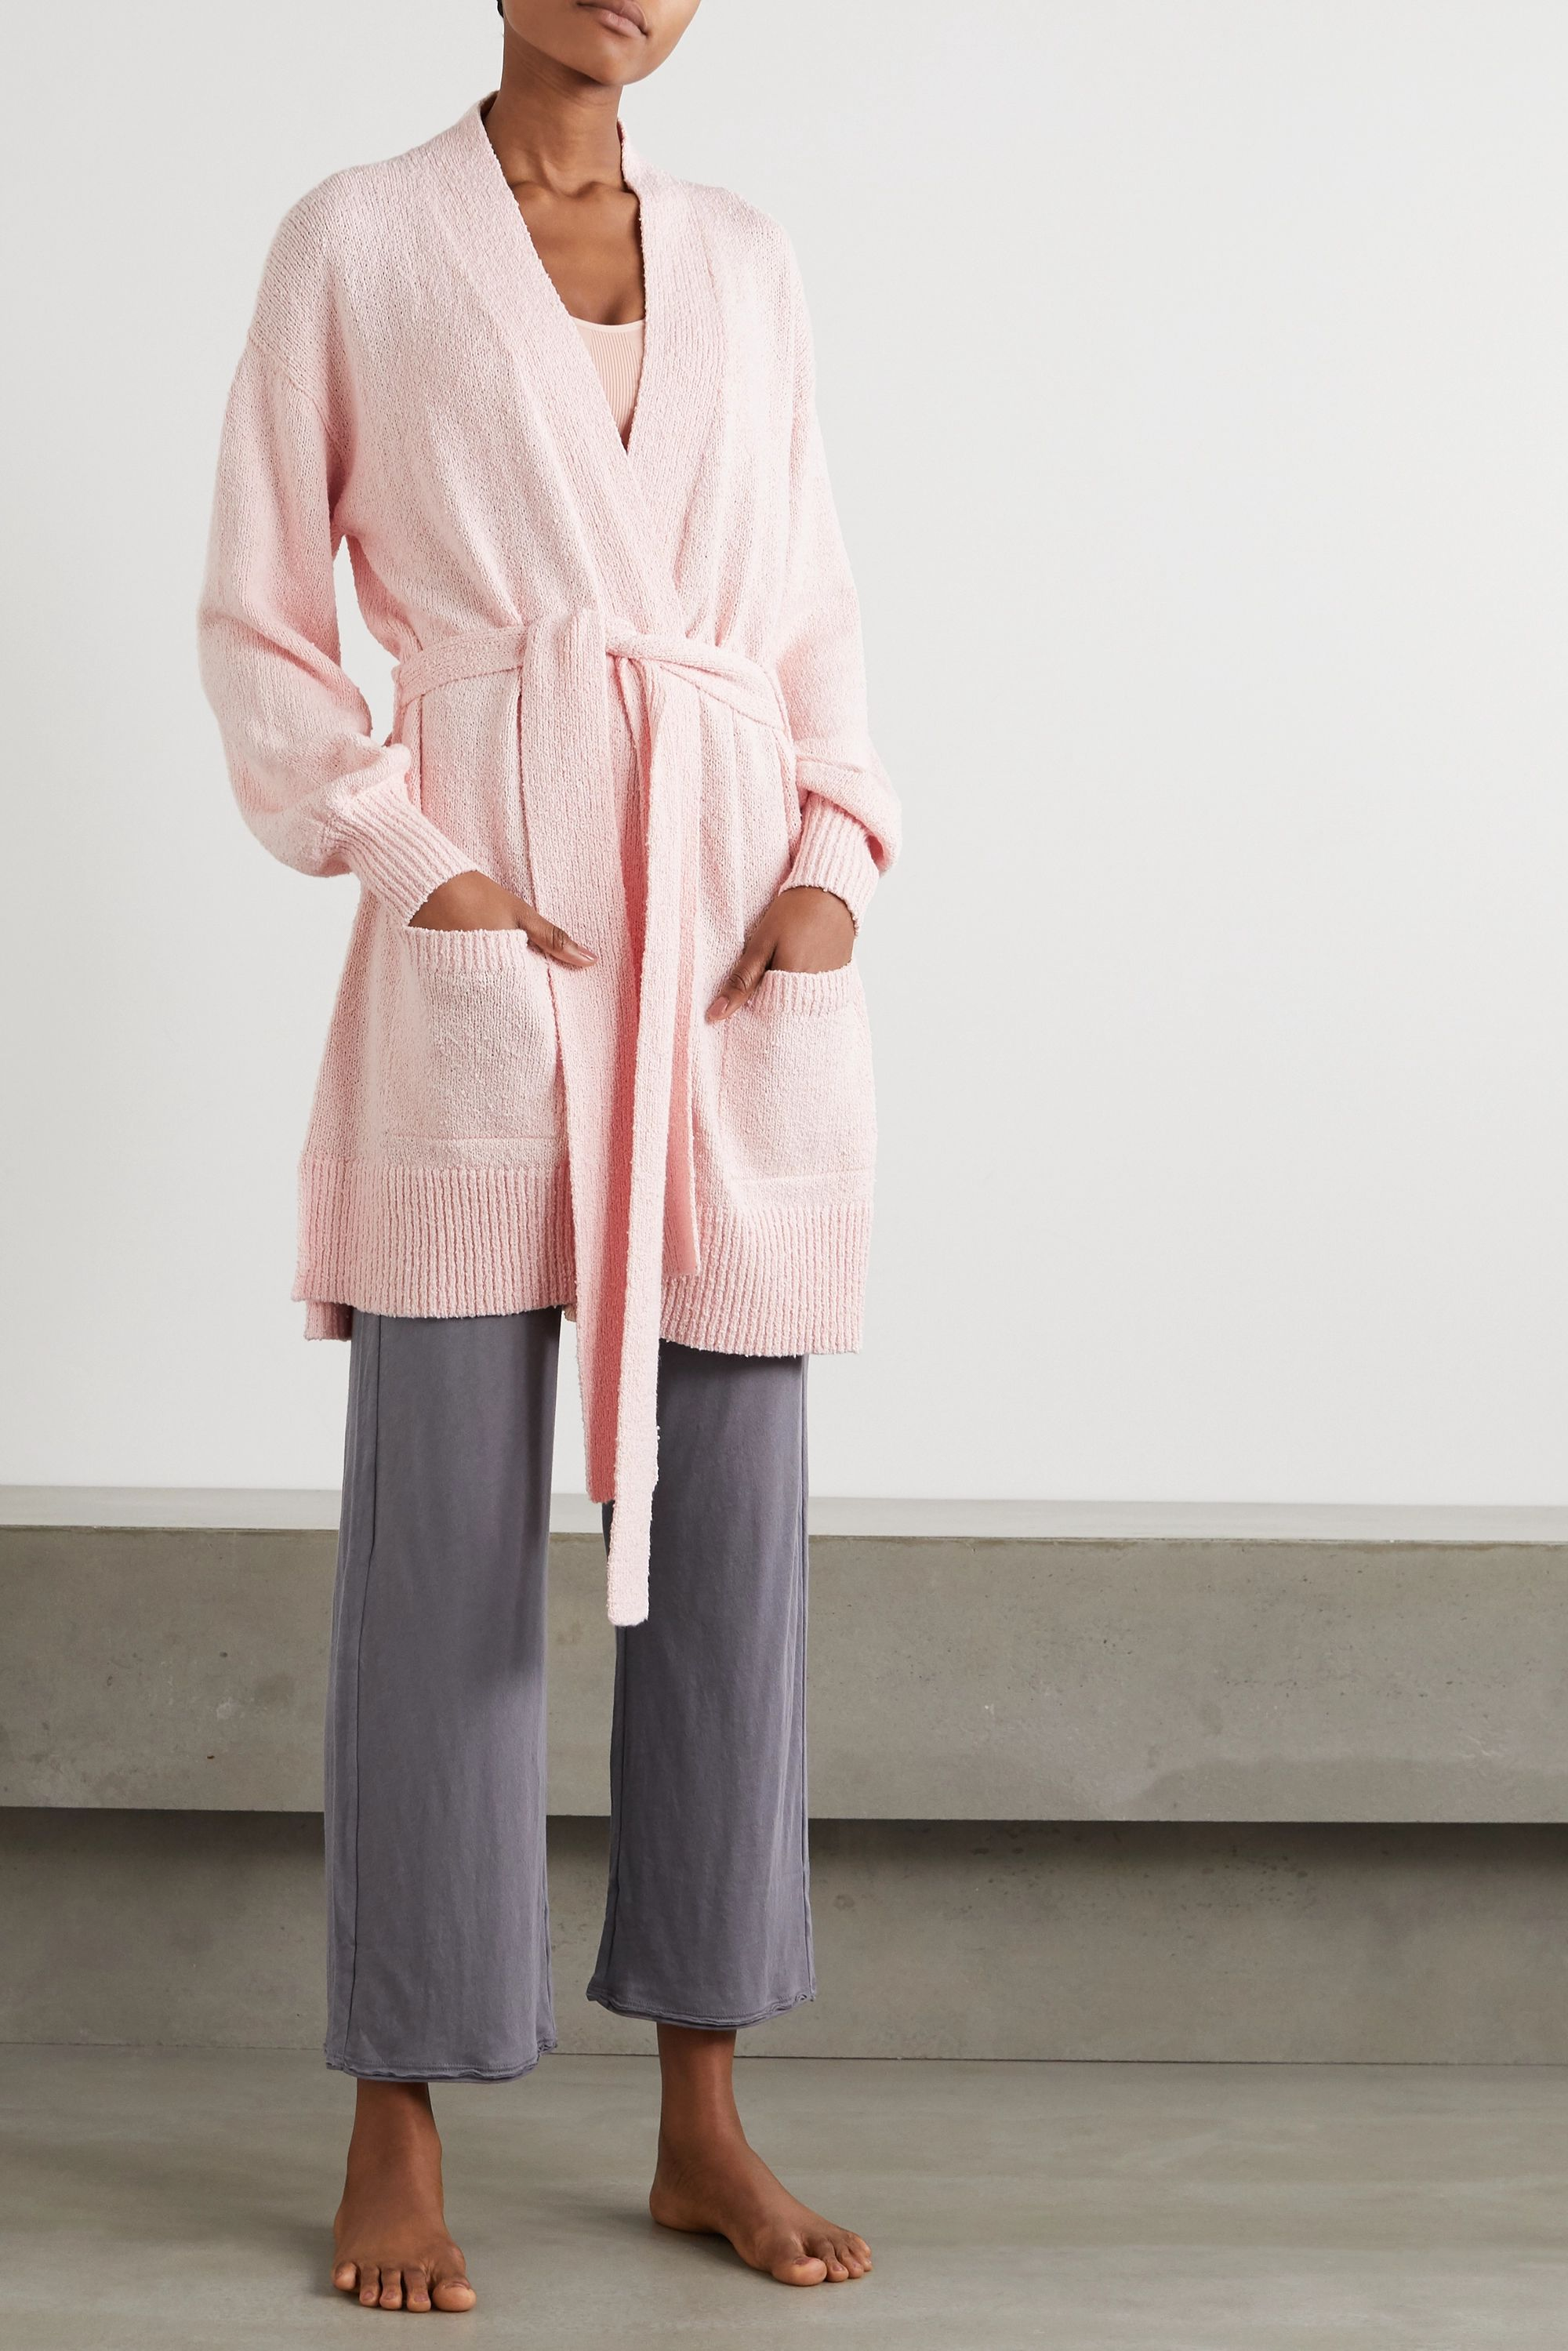 Skin Marlee 配腰带有机棉质比马棉质毛巾布开襟衫